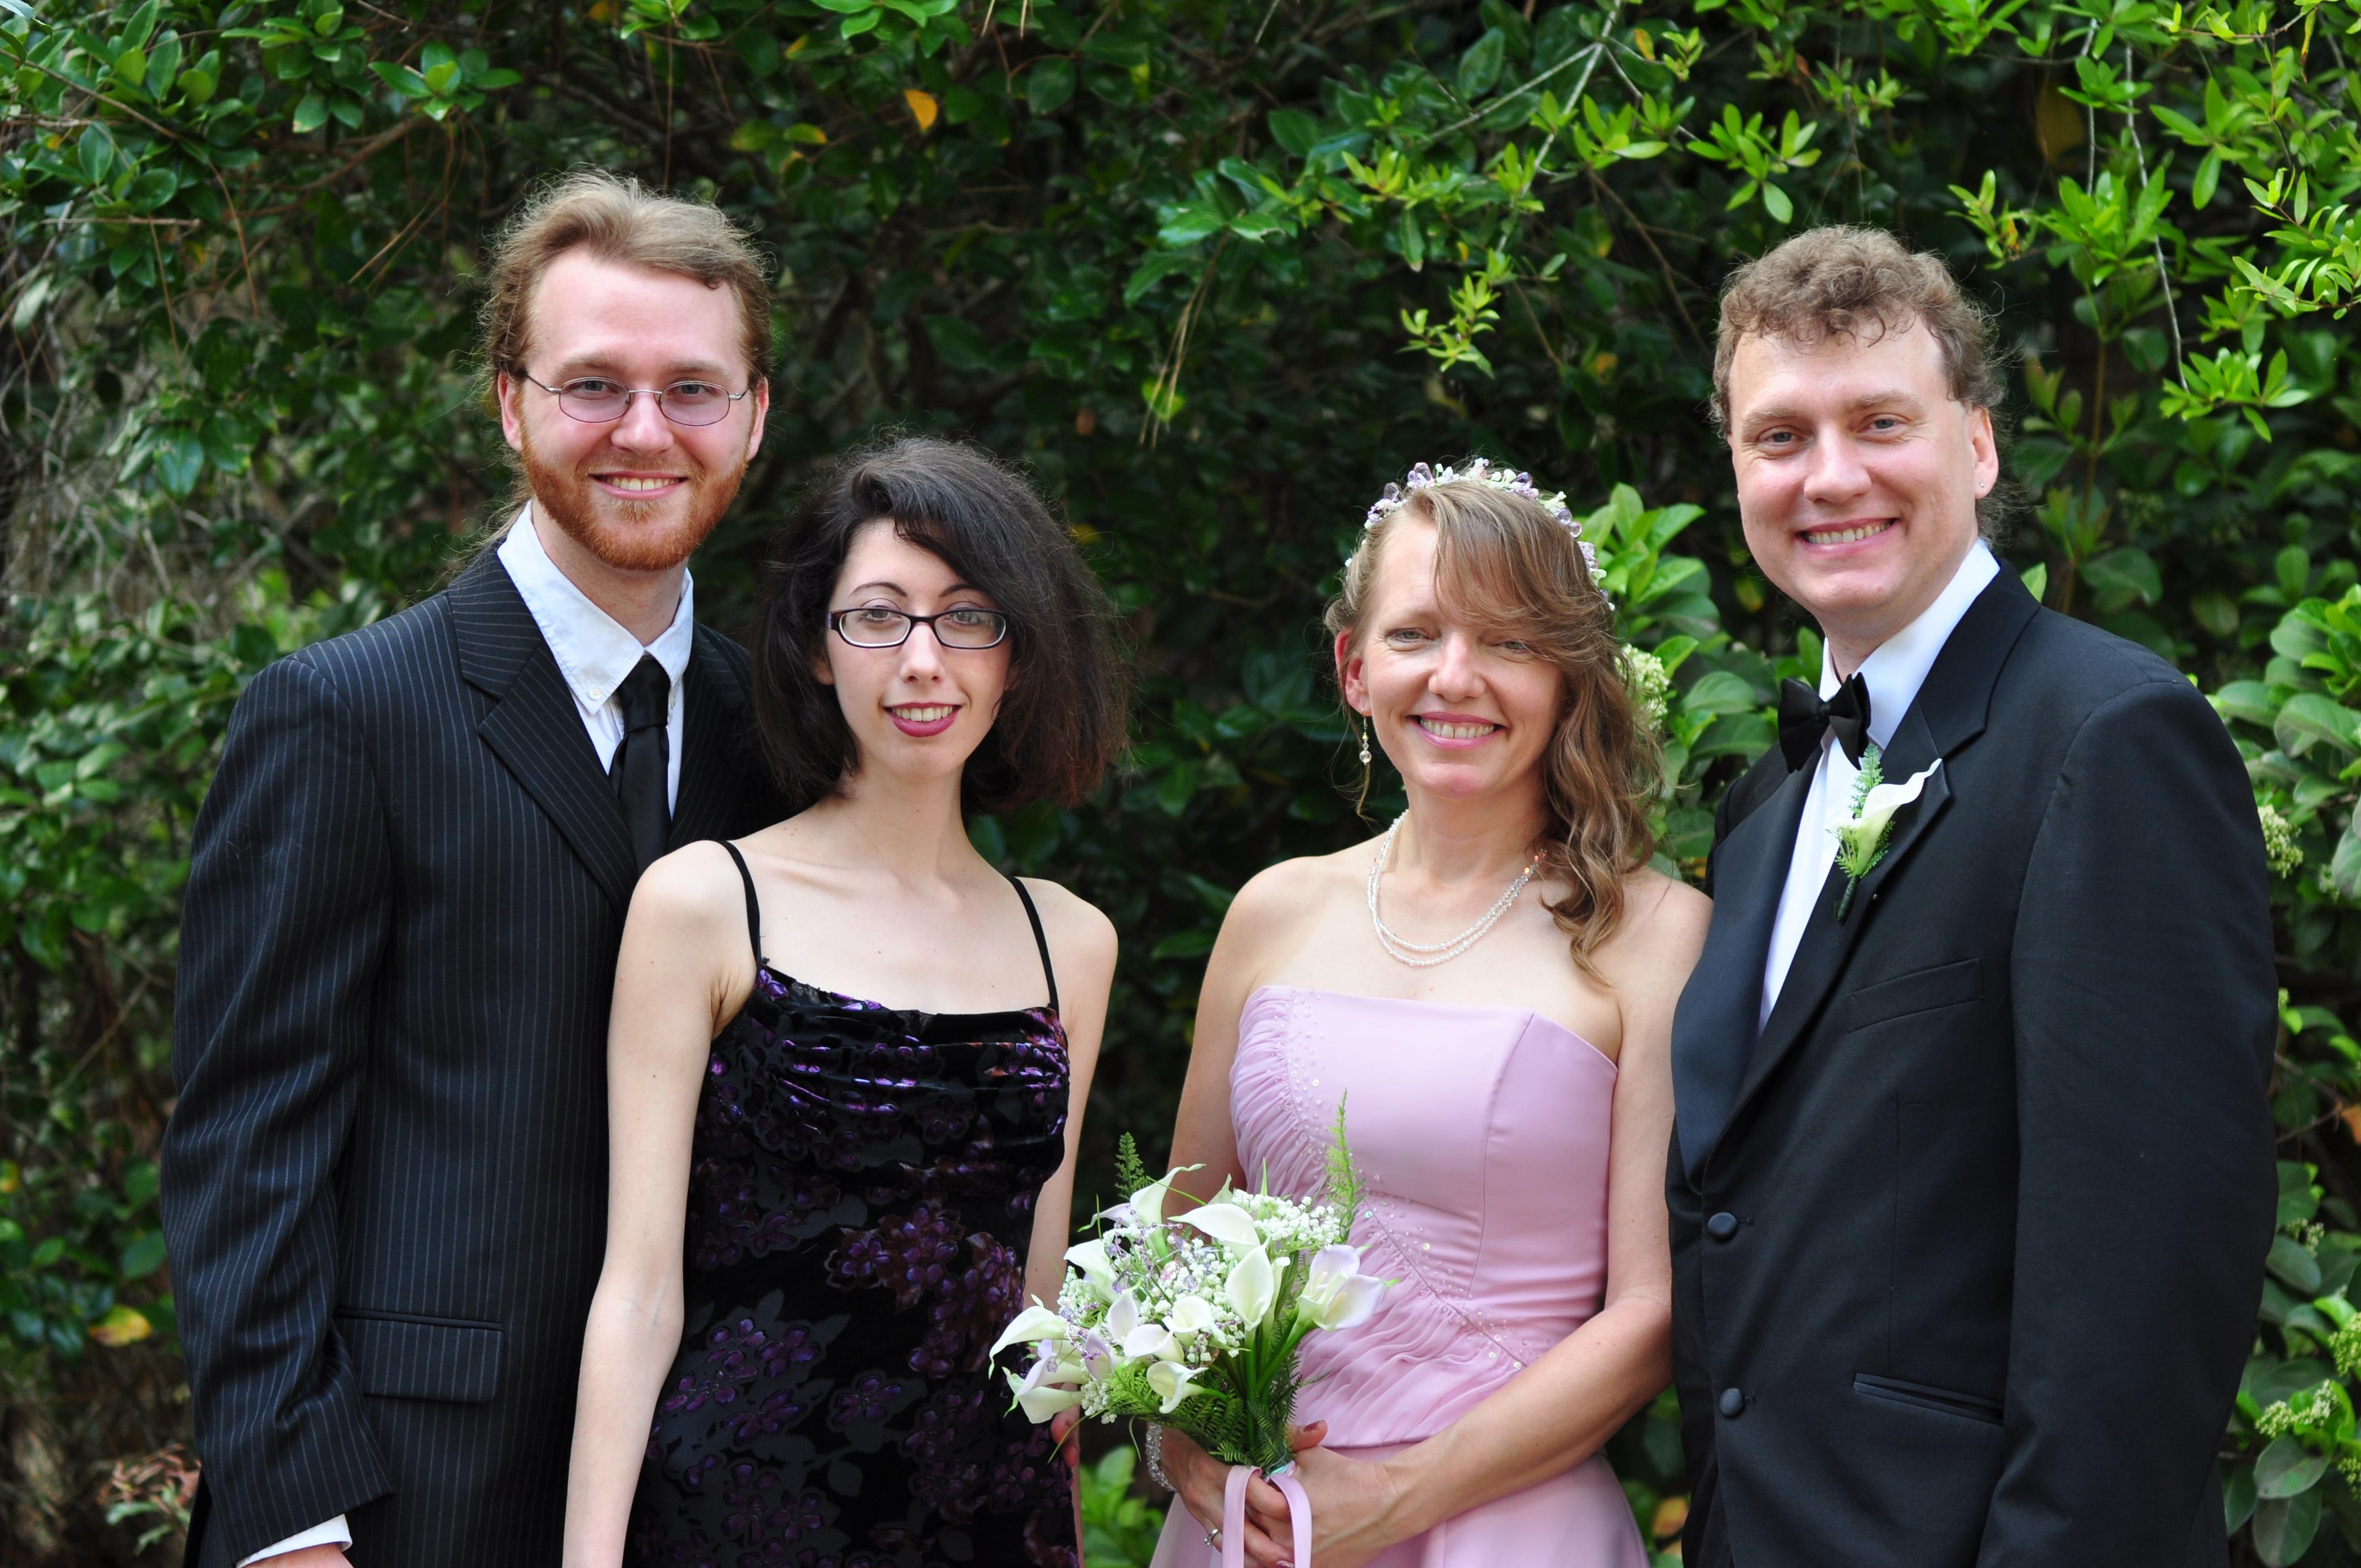 emily-and-travis-4-1-2013-april-fools-wedding-384